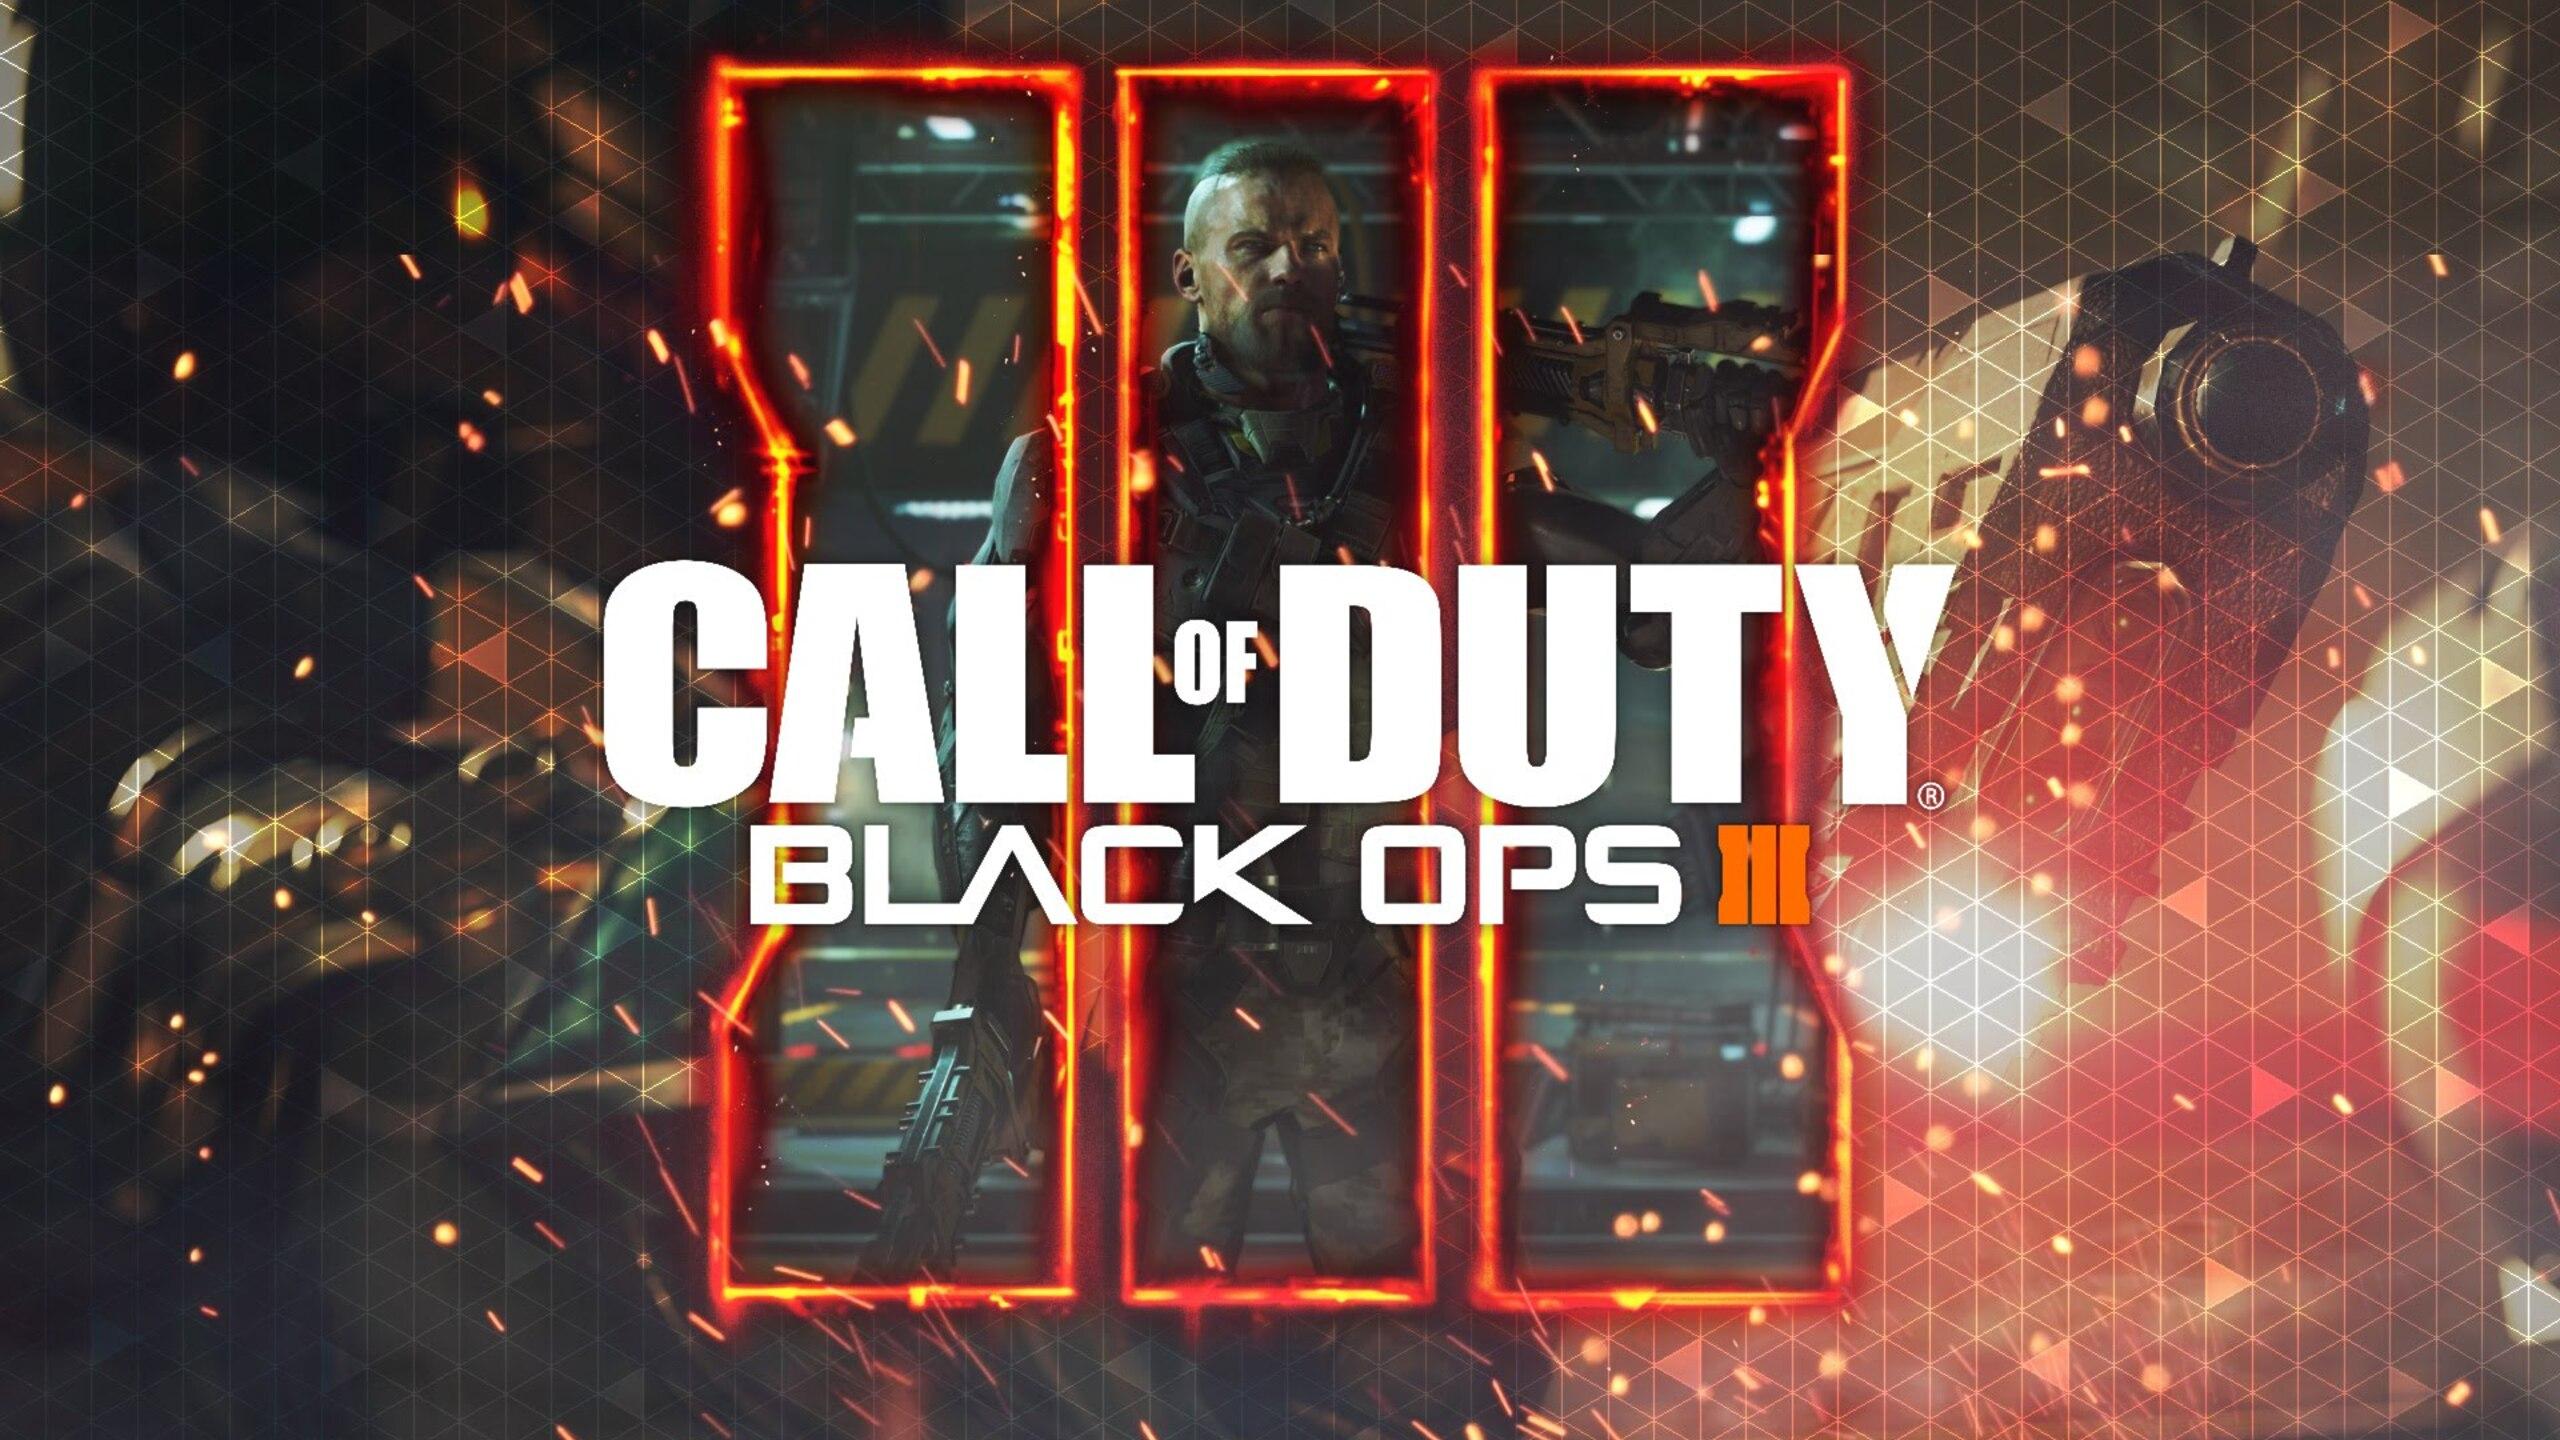 2560x1440 2016 Call Of Duty Black Ops 3 Hd 1440p Resolution Hd 4k